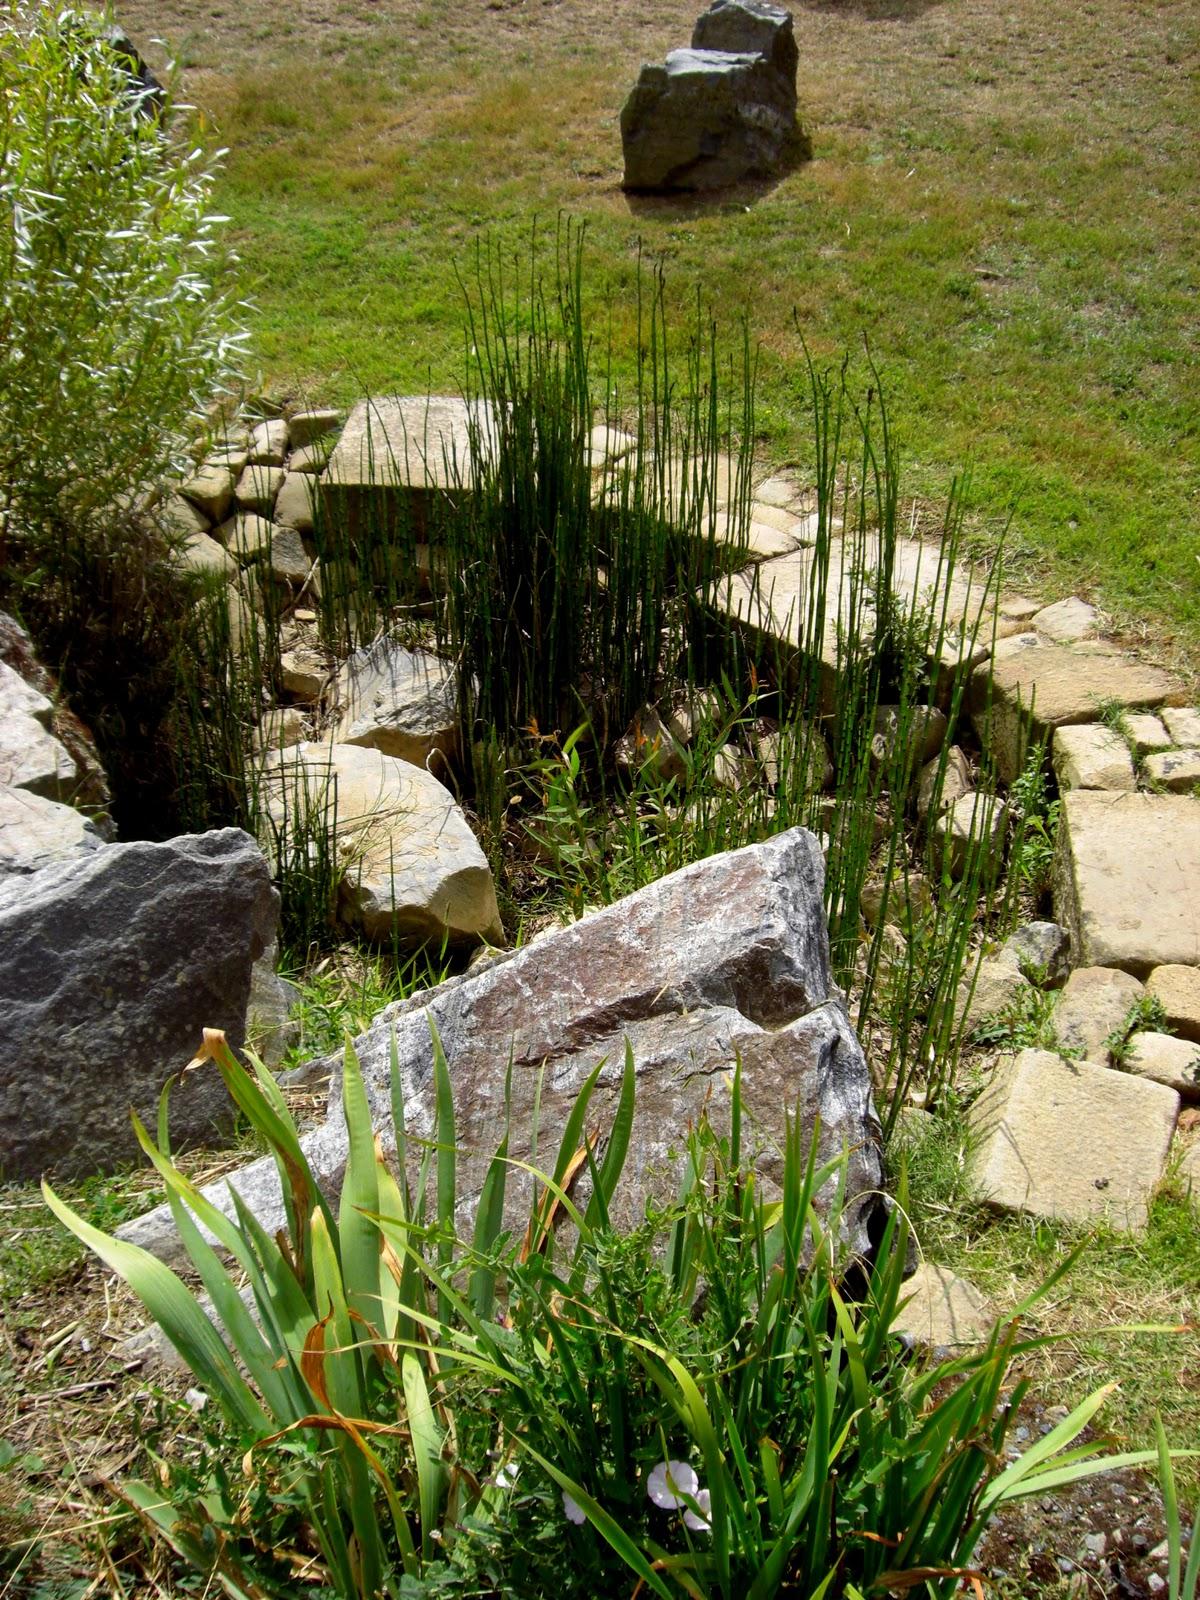 Paradis express le jardin toil paimboeuf for Jardin etoile paimboeuf